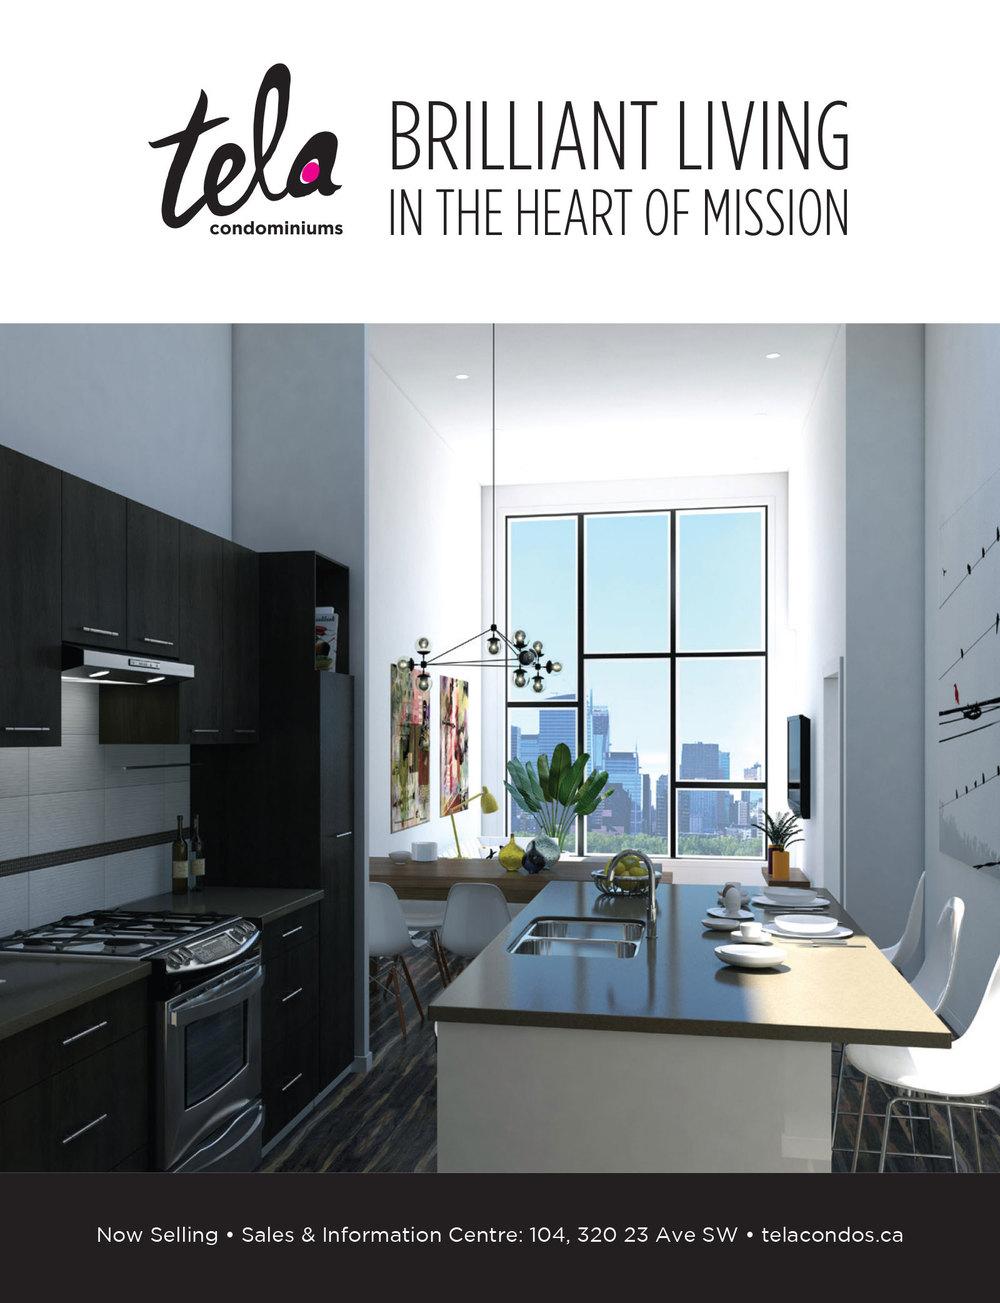 Tela Condominiums: residential development marketing